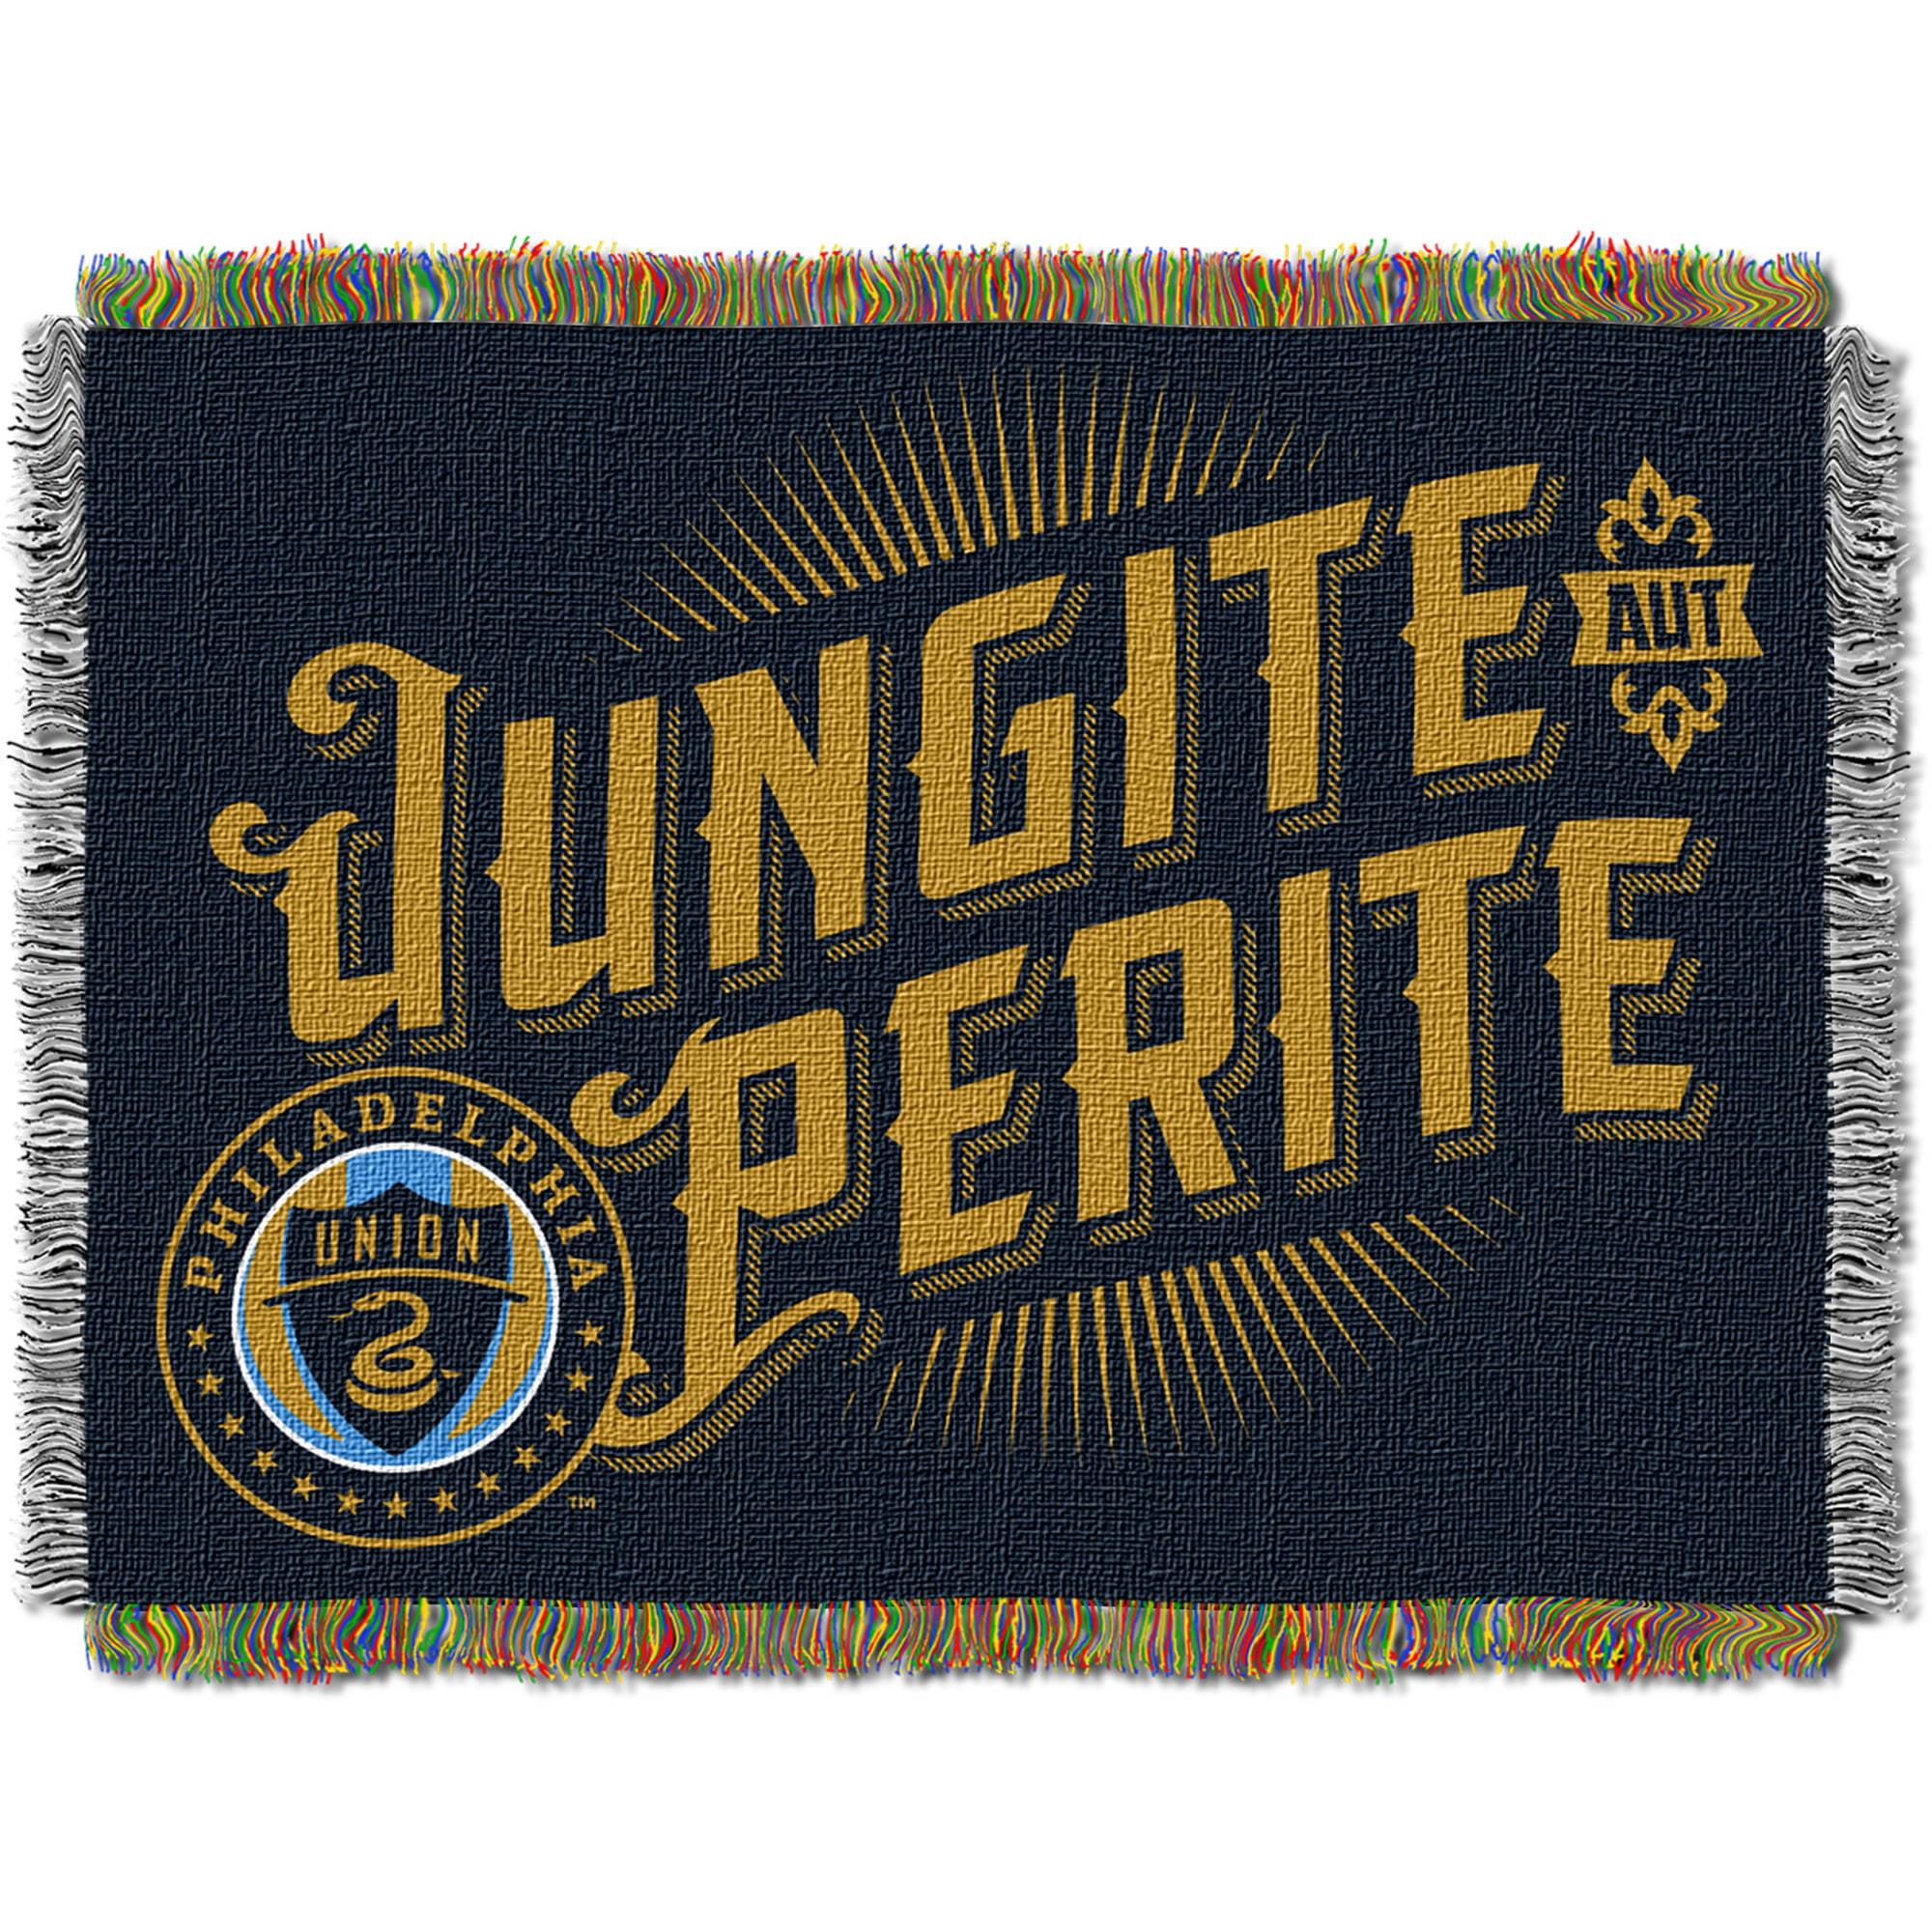 "MLS Philadelphia Union Handmade 48"" x 60"" Woven Tapestry Throw"